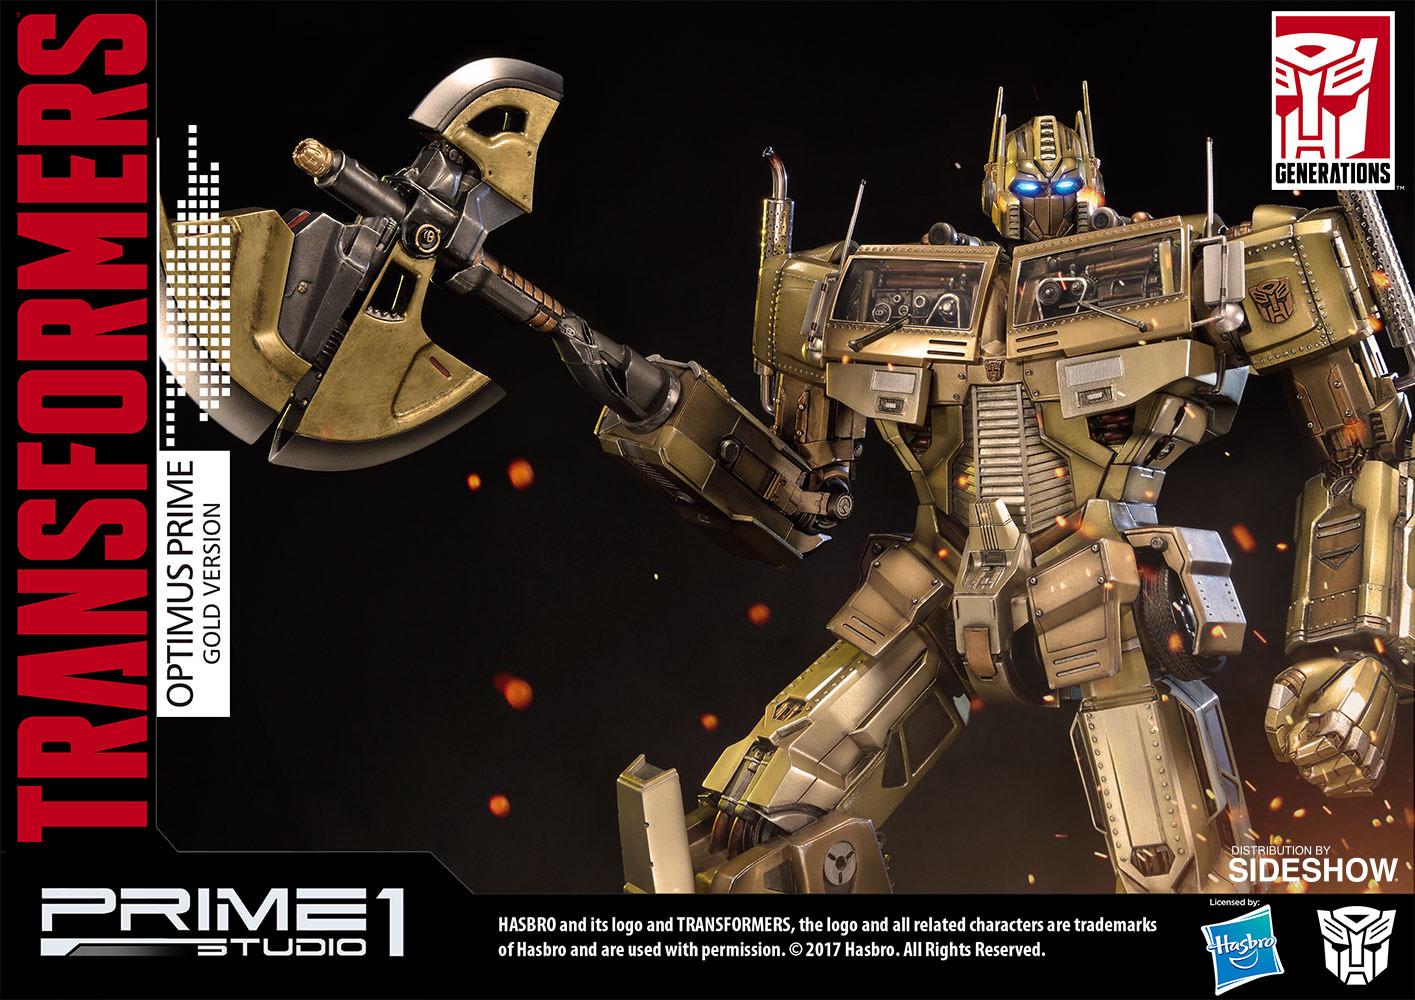 transformers optimus prime gold version - transformers gener